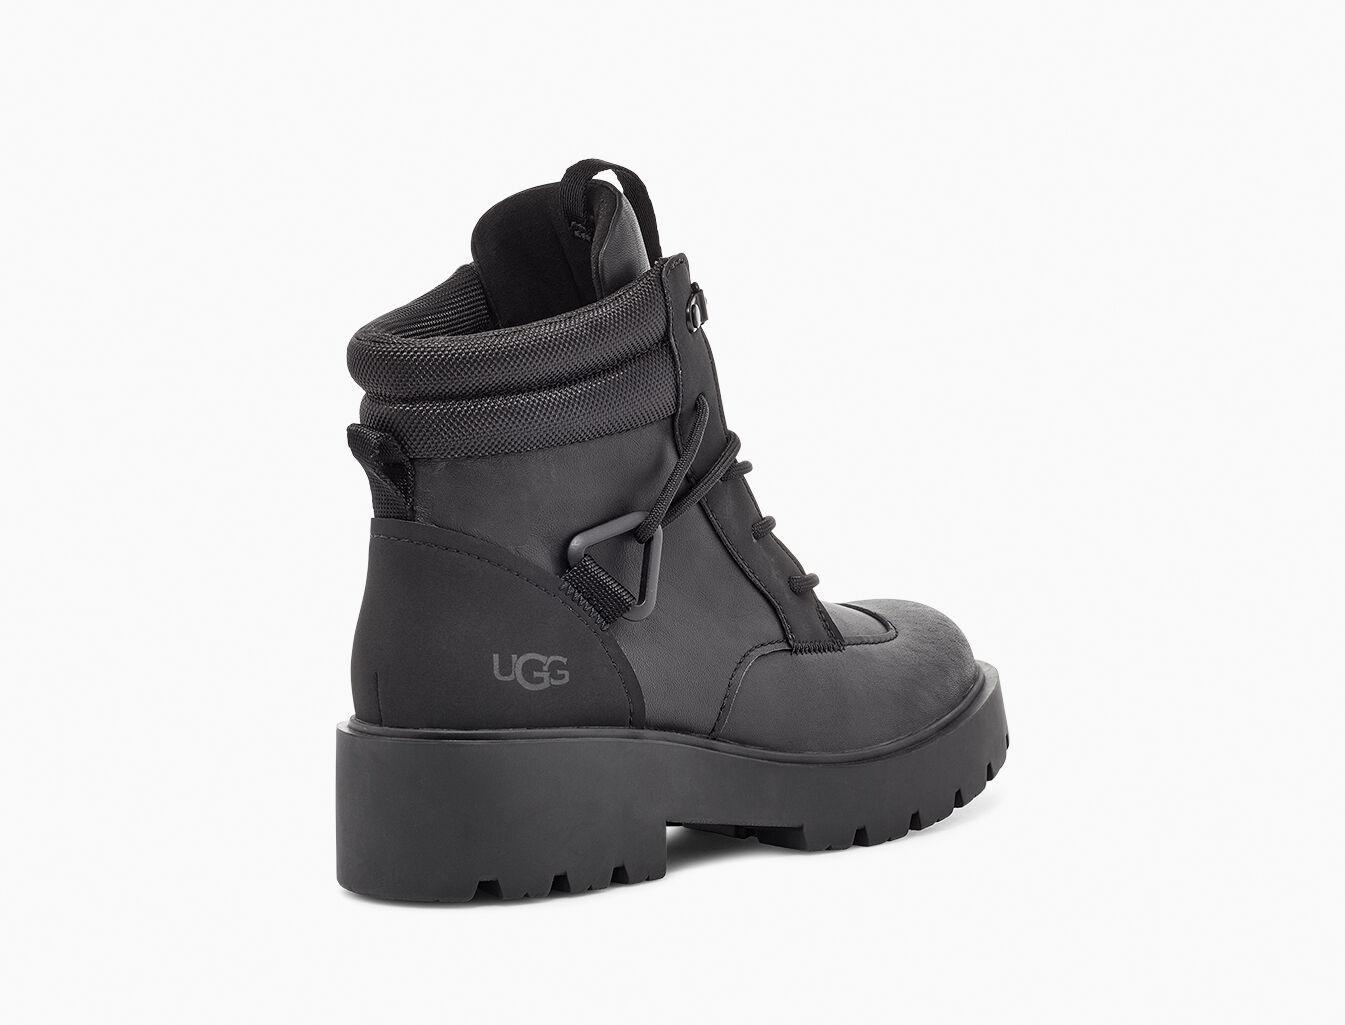 Tioga Hiker | UGG® Official